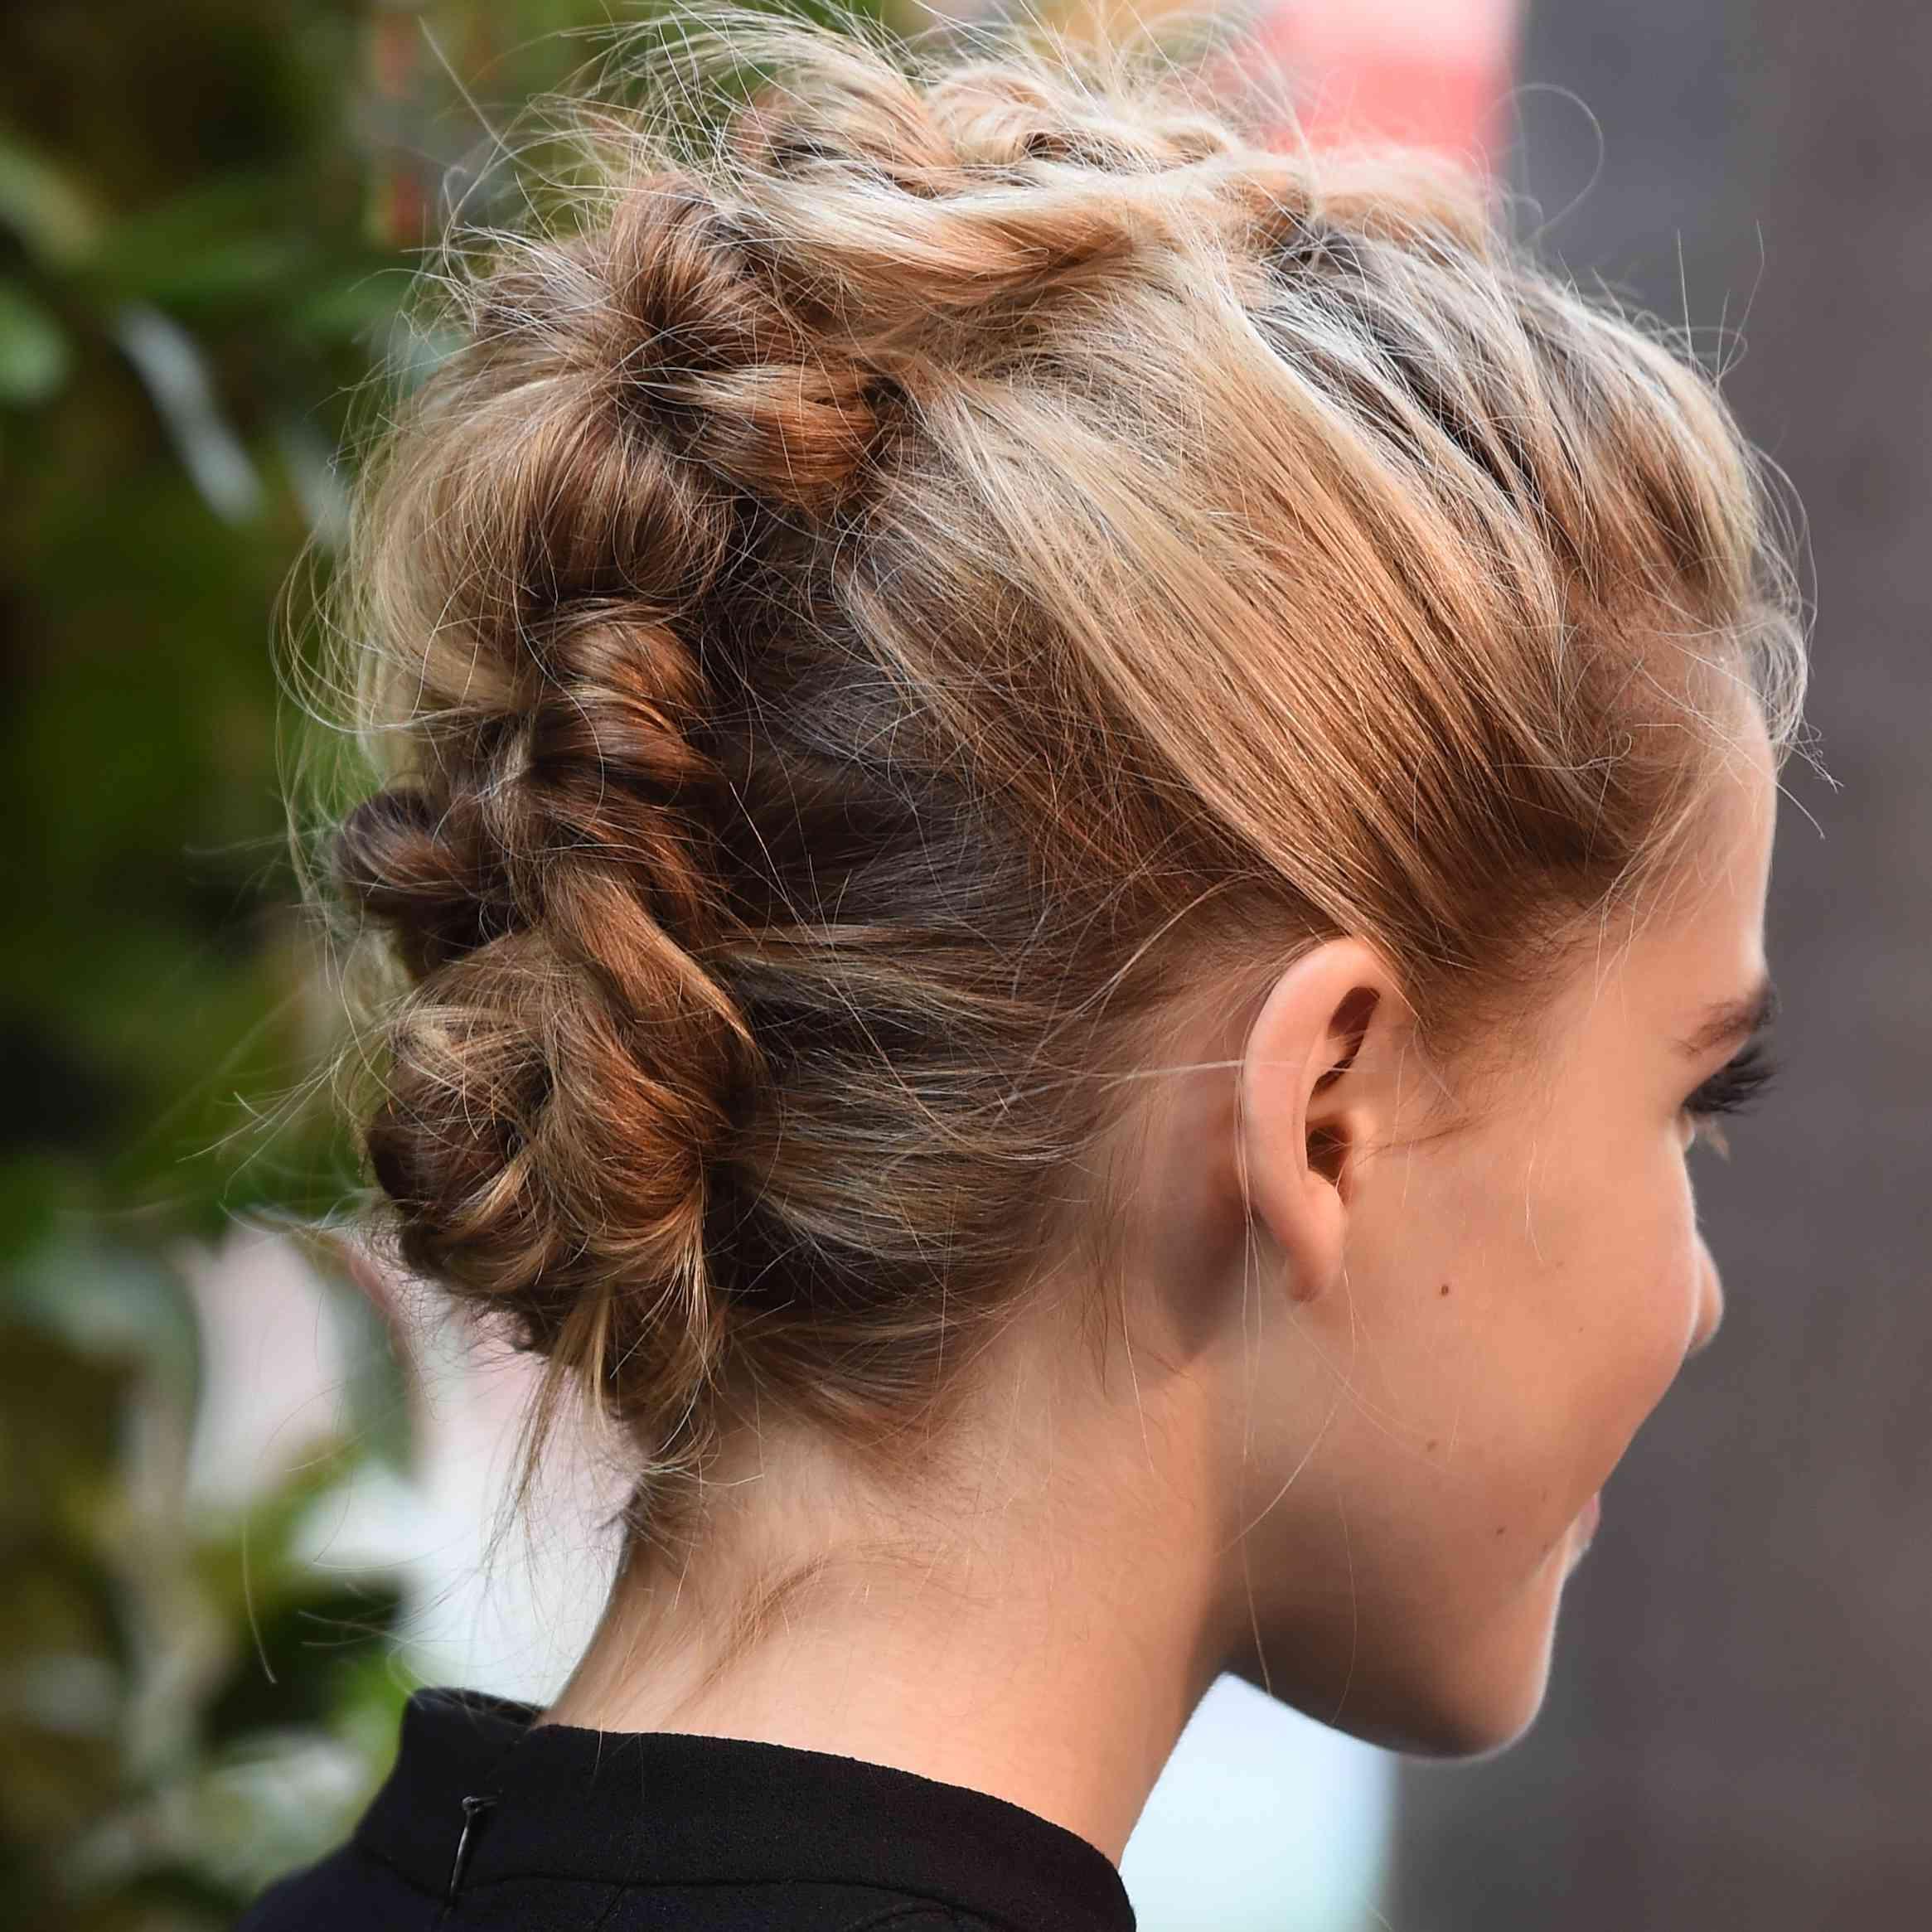 9 Bridesmaid Hairstyles For Short Hair